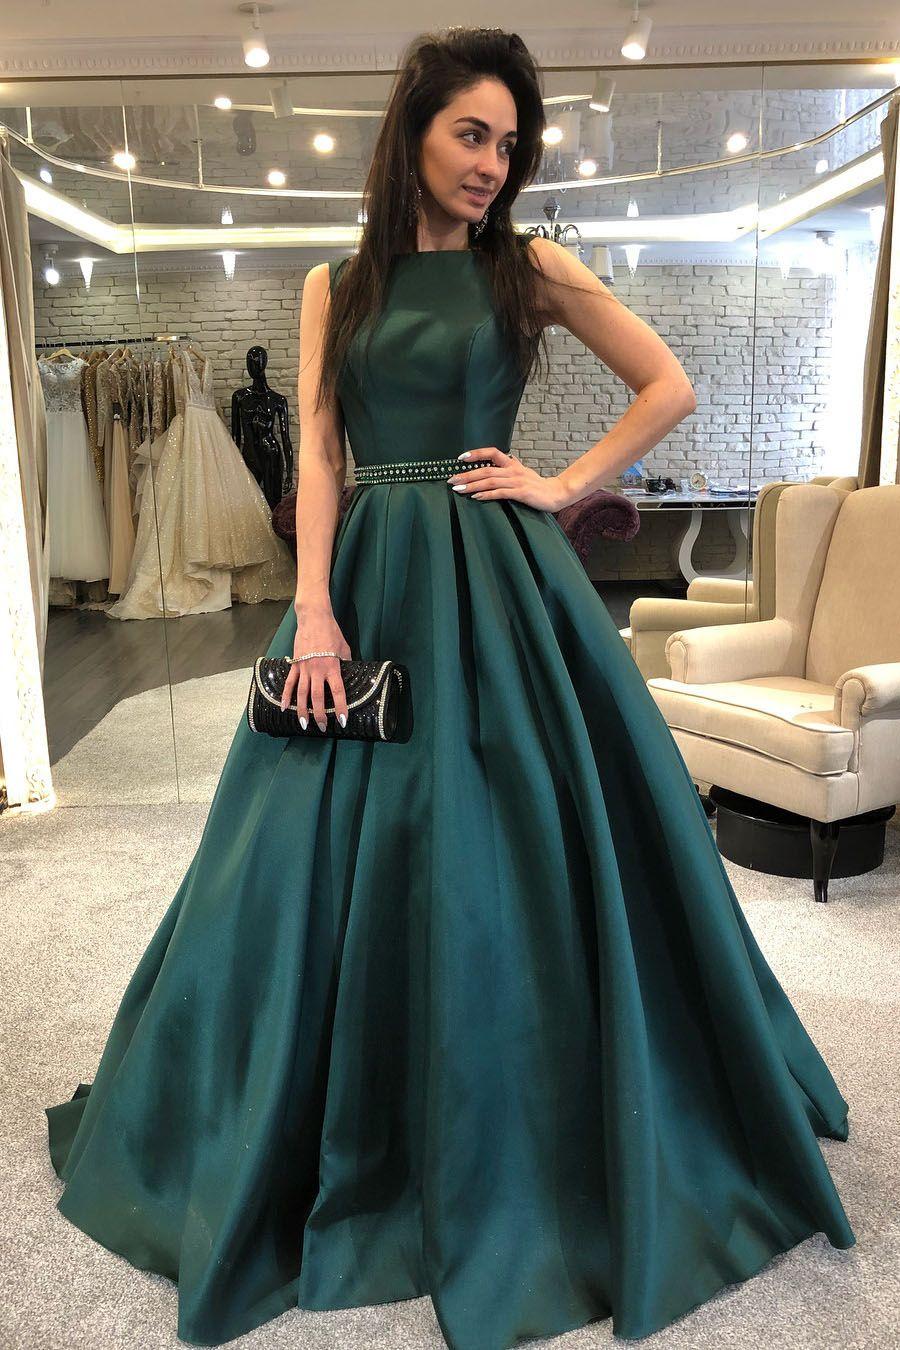 Green backless prom dress  Elegant Aline Hunter Green Long Formal Evening Dress  SATIN